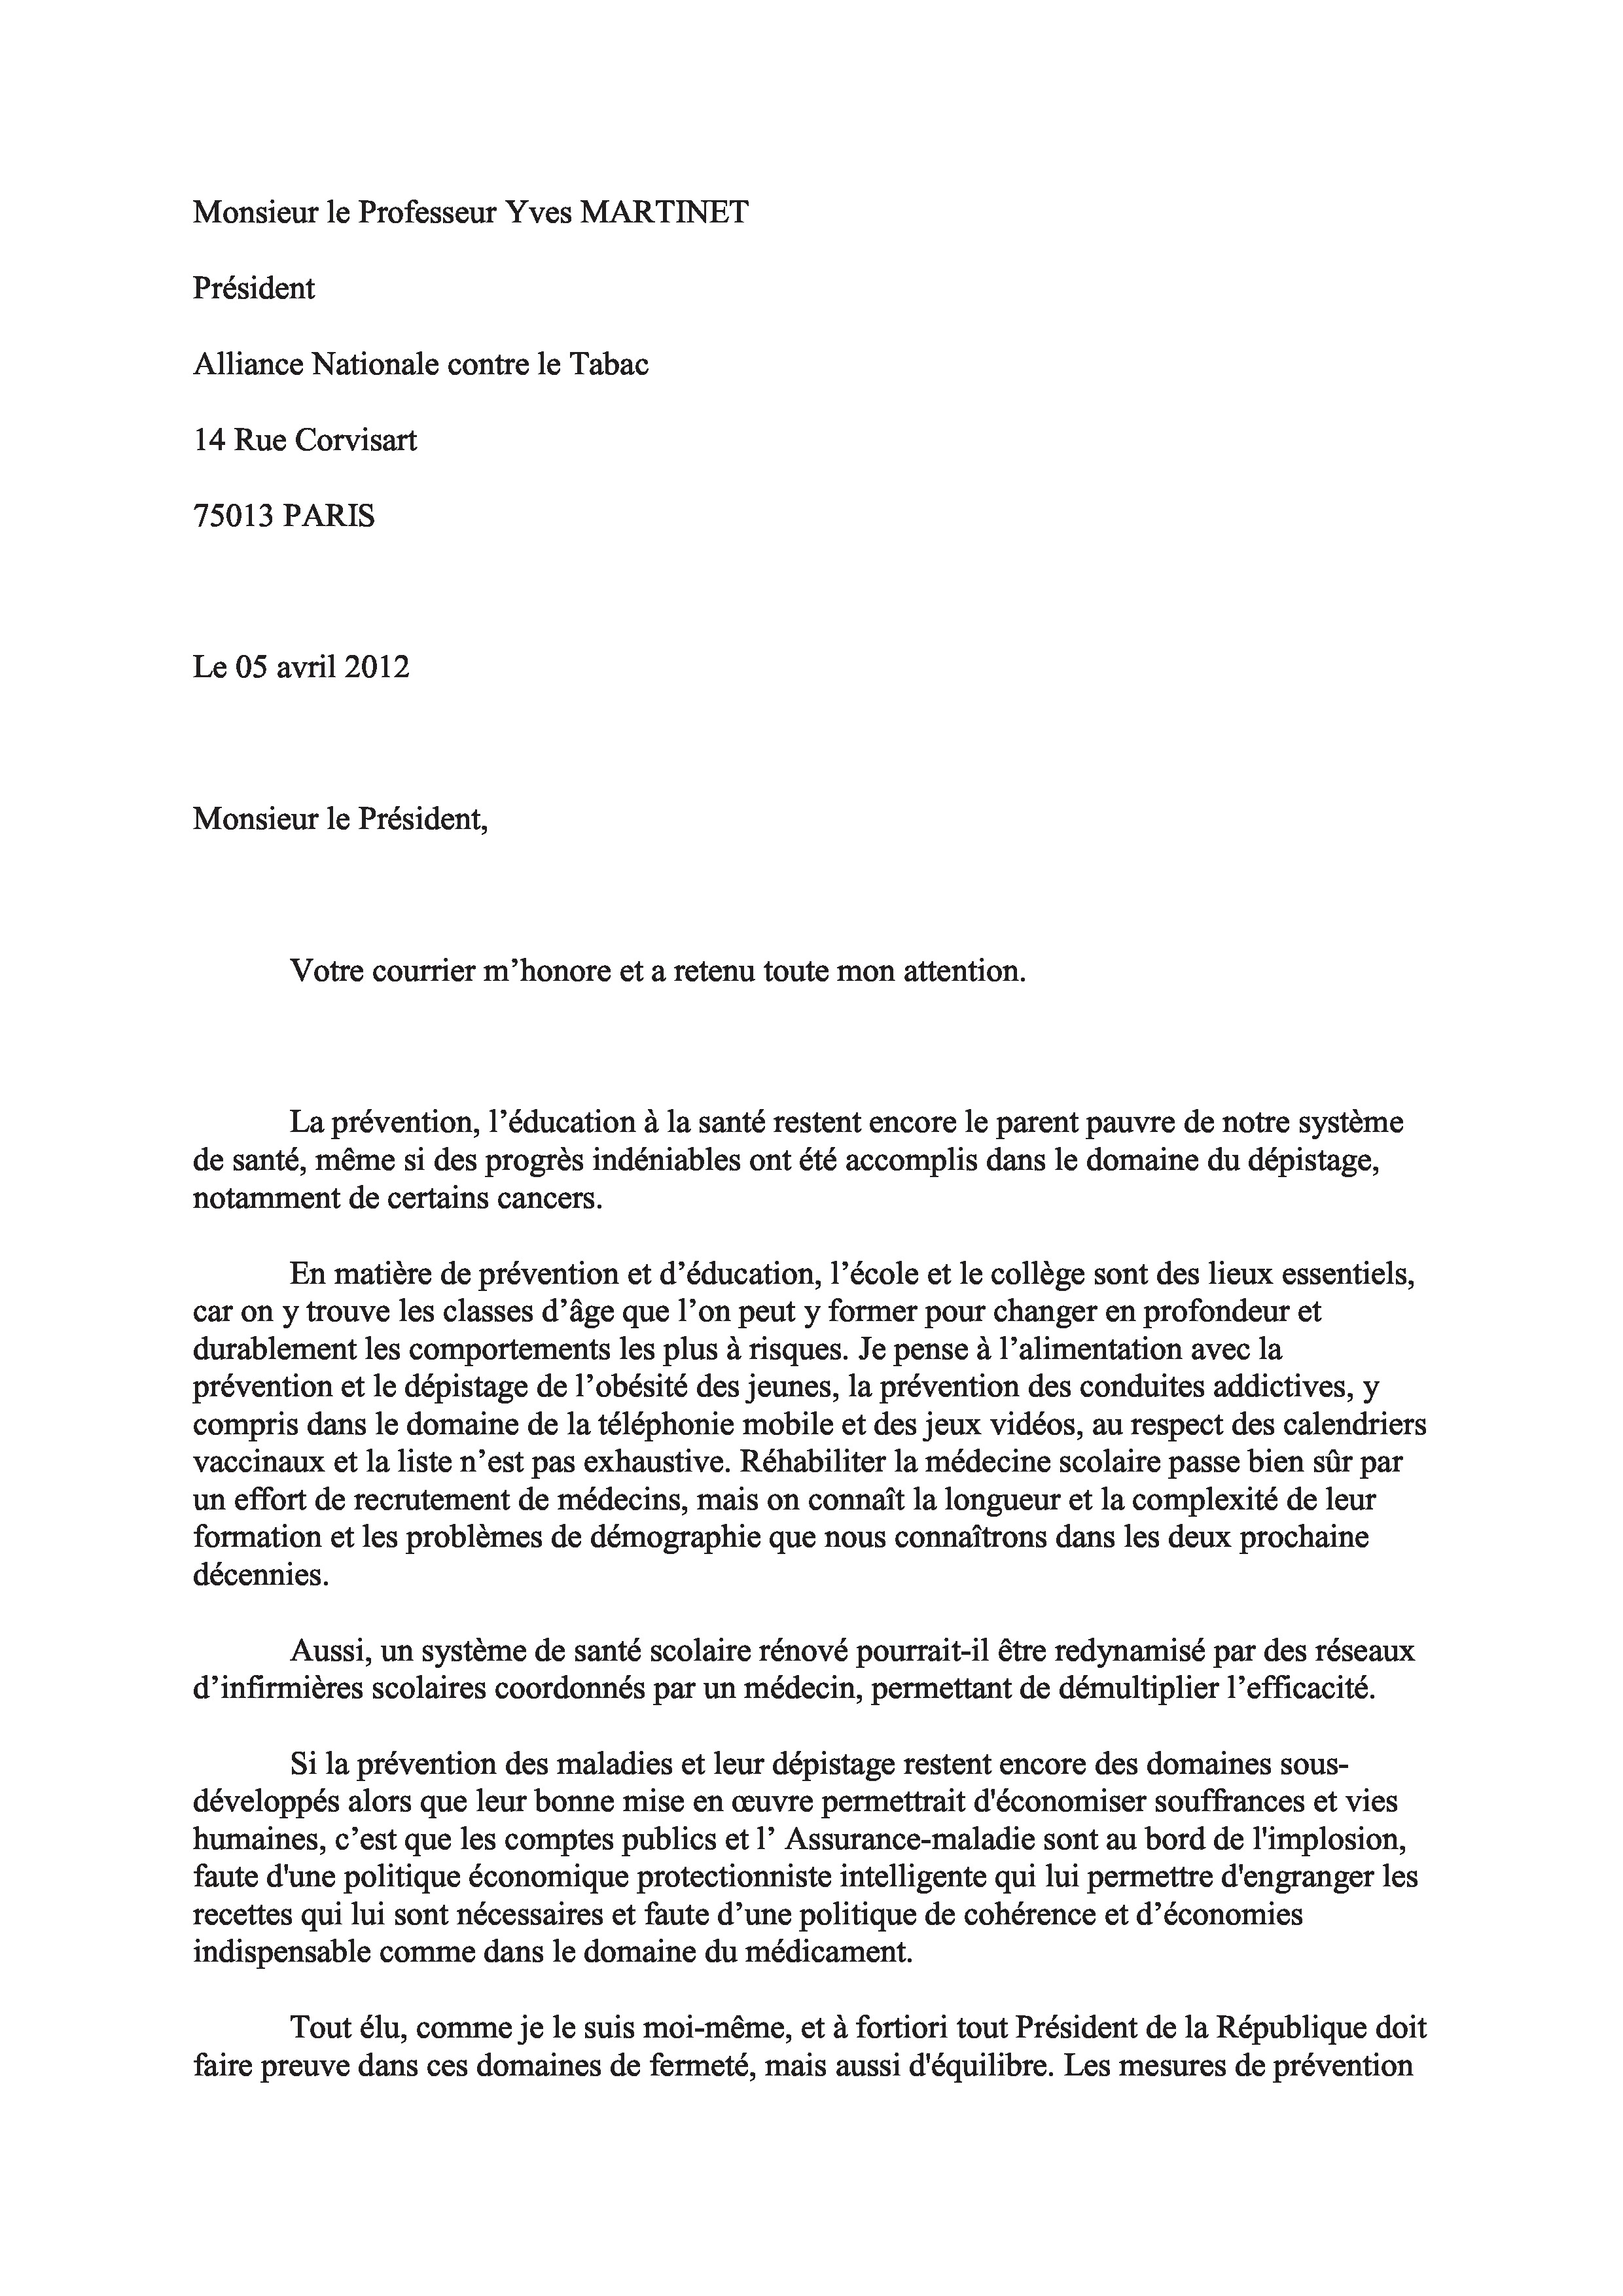 Alliance-dossier-presse-livre-blanc-11avr2012_Page_12.jpg